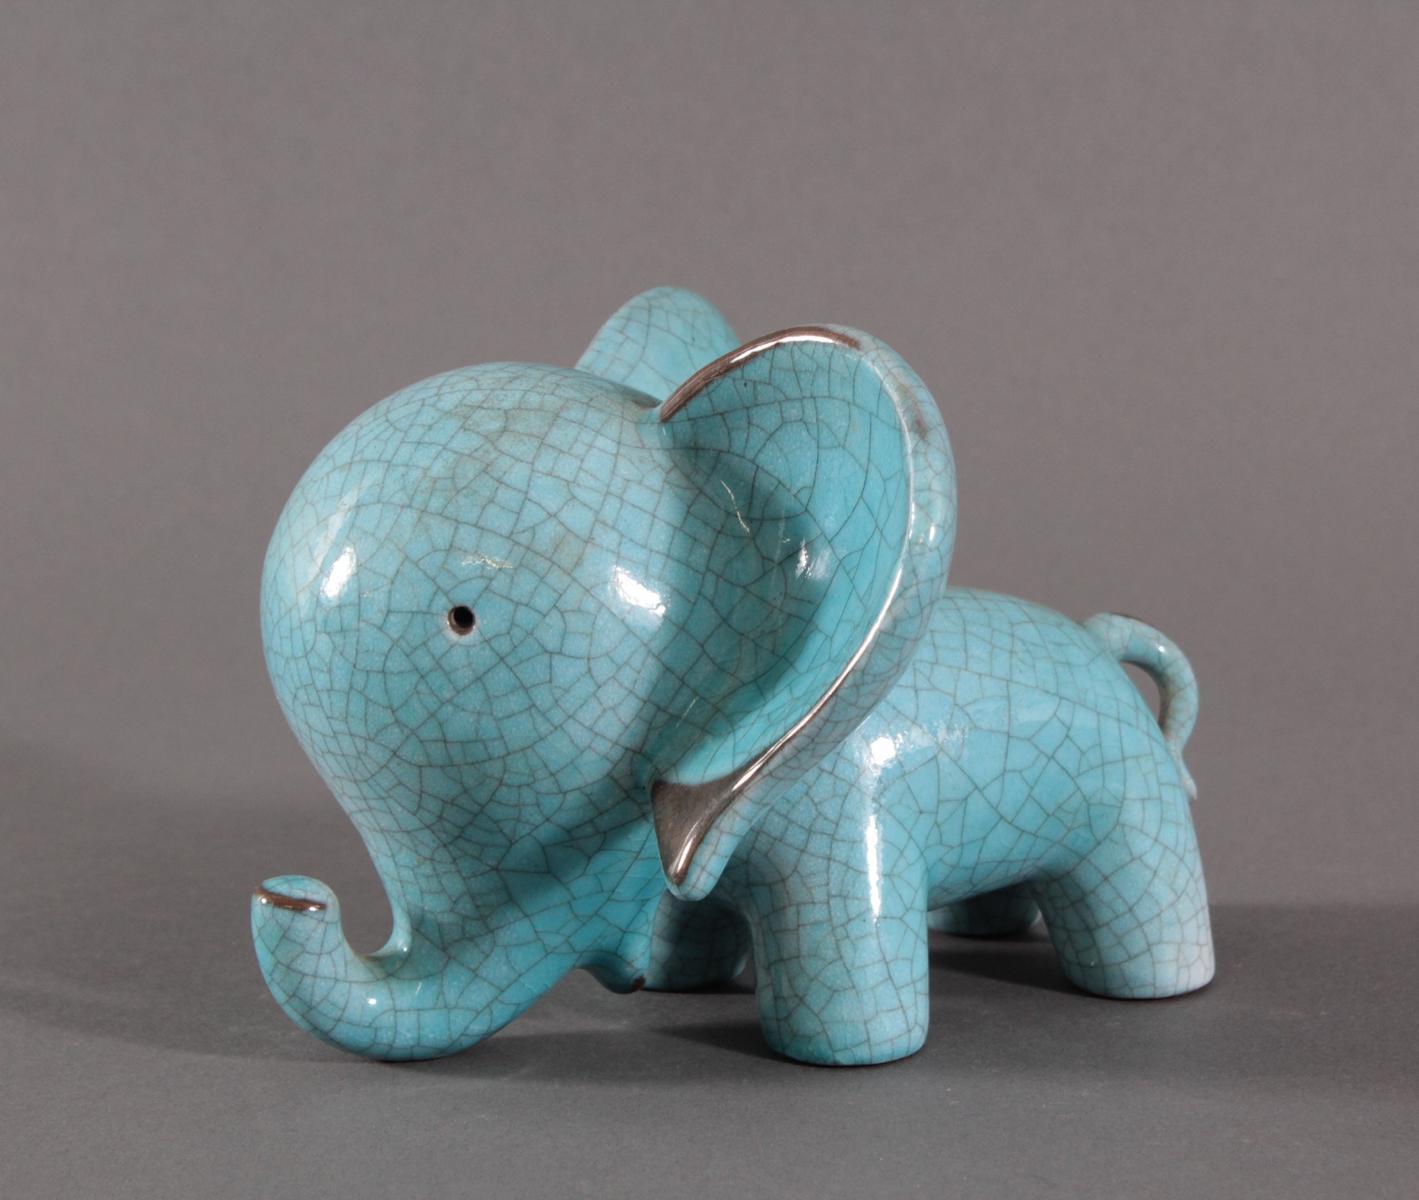 Keramik-Miniaturtierplastik, 'Elefant', Karlsruher Majolika, um 1956-88, Entw.: Walter Bosse-2